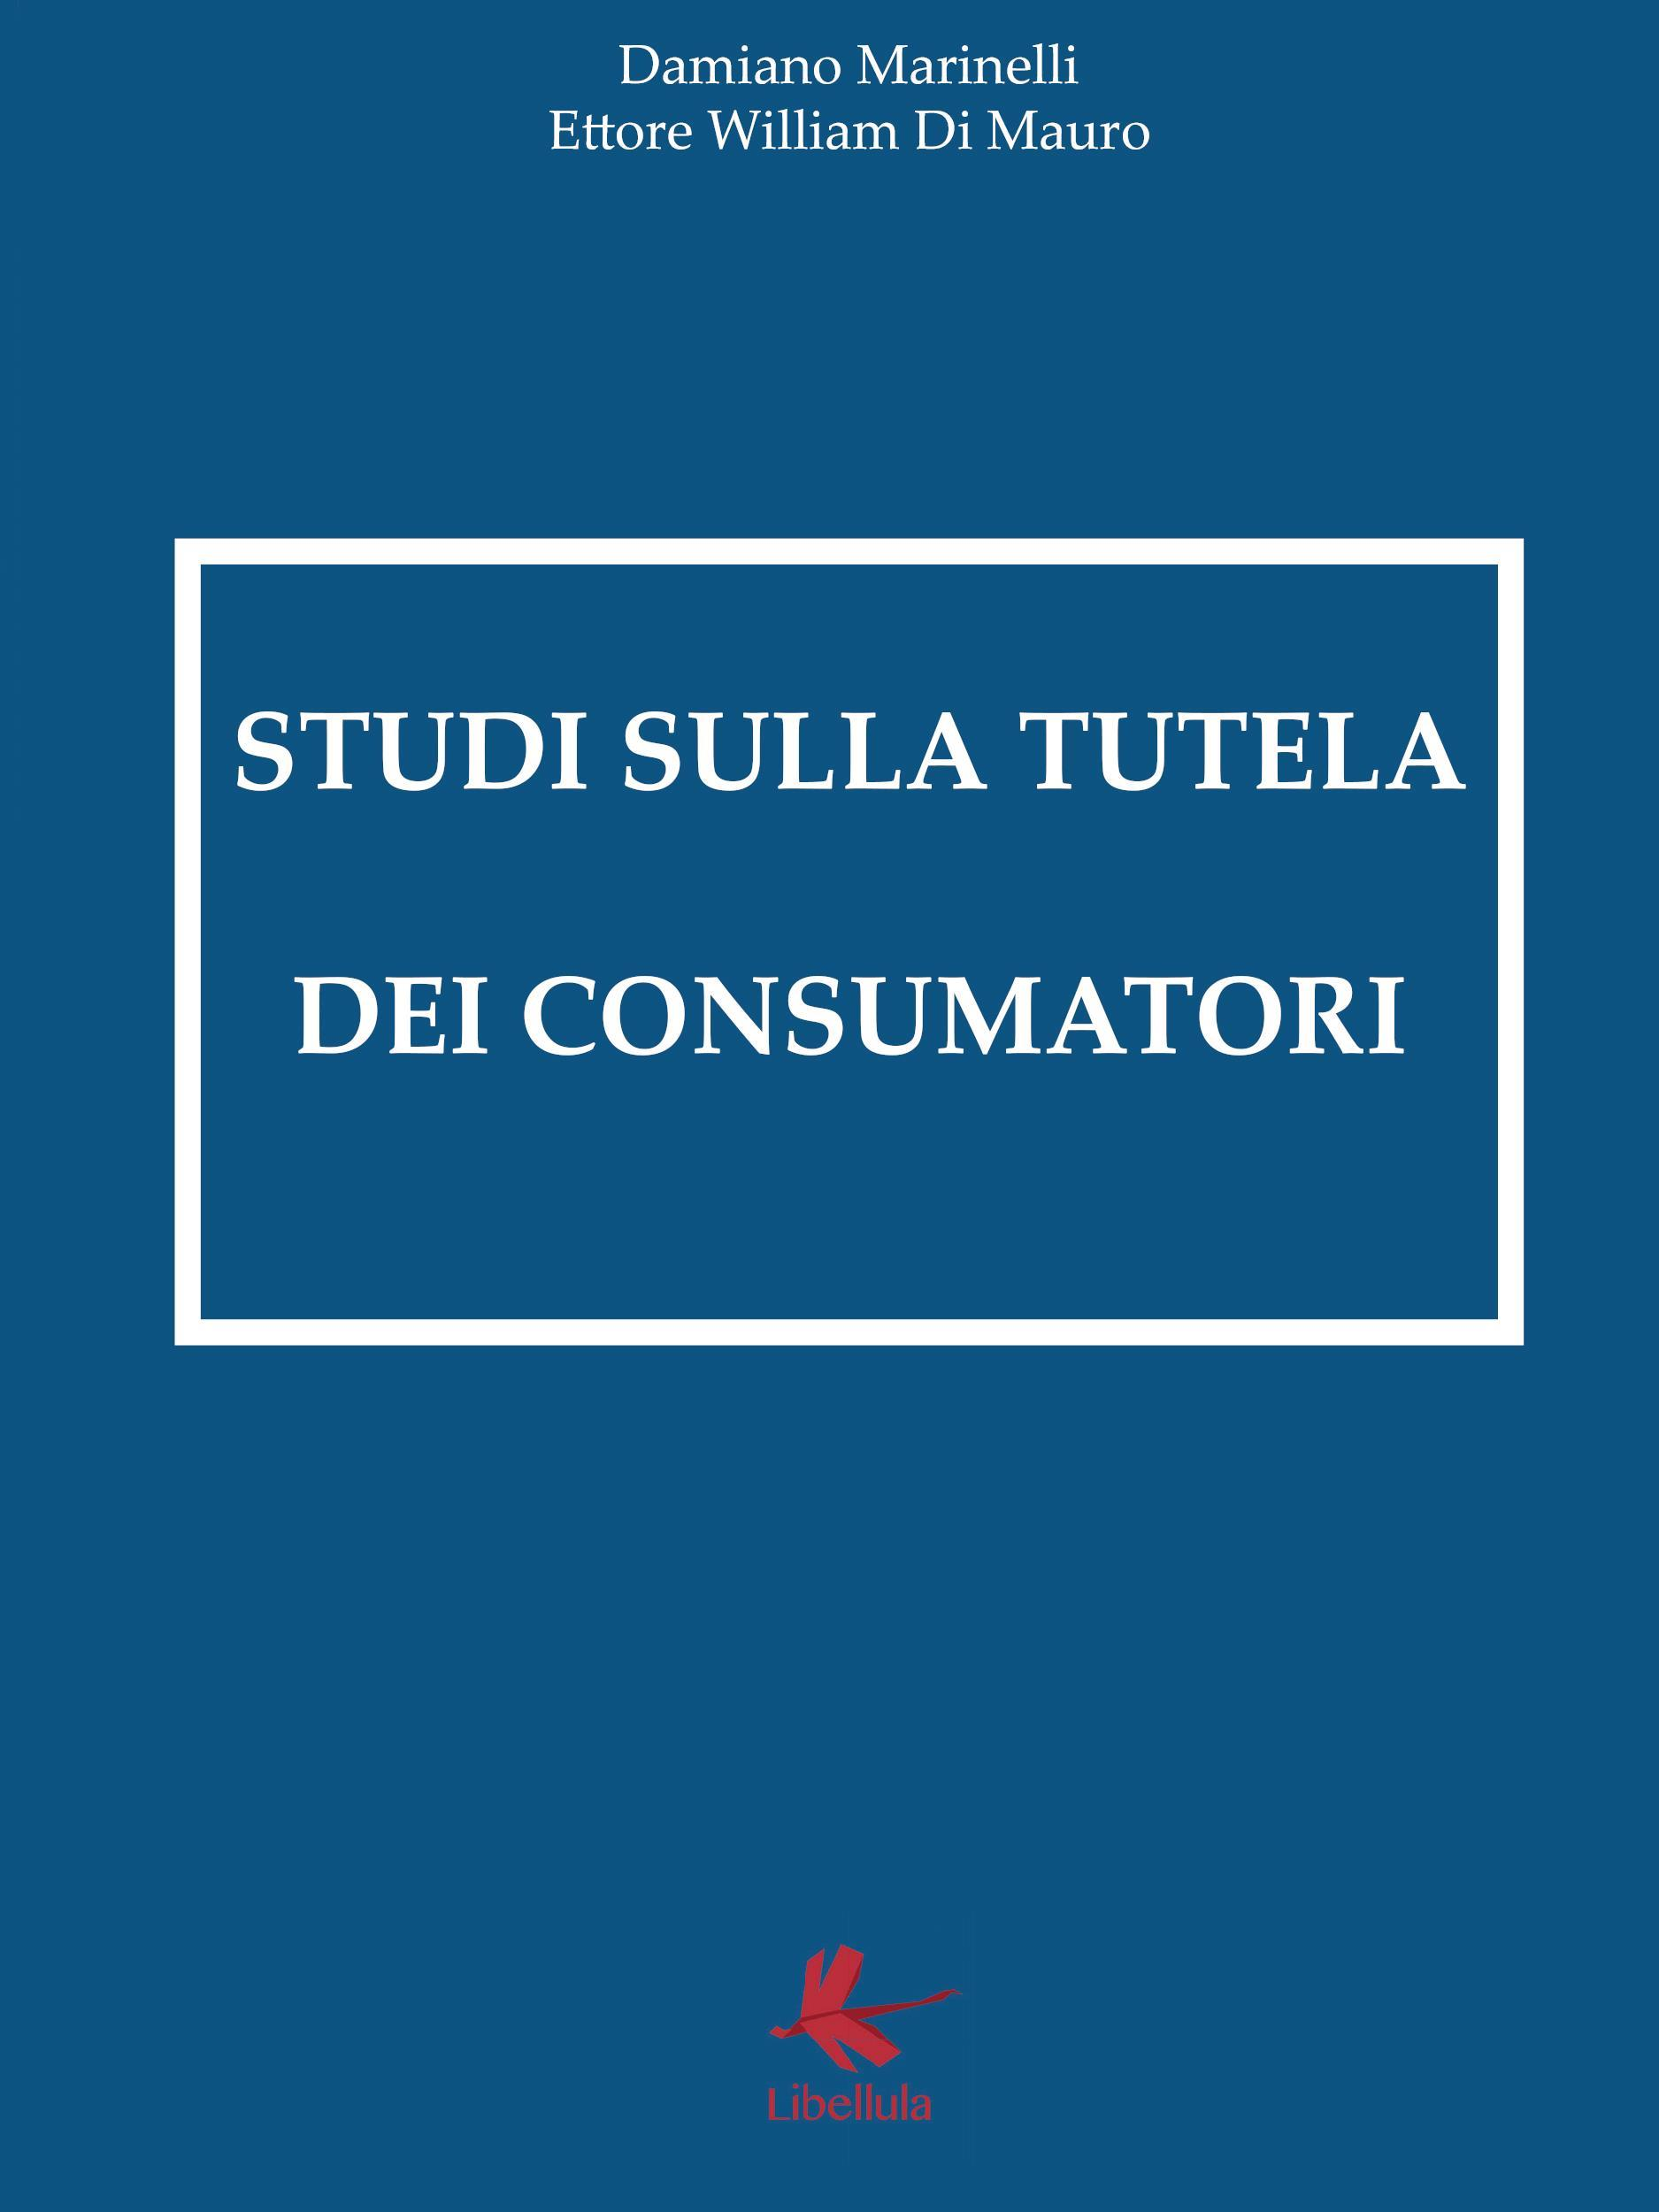 Studi sulla tutela dei consumatori